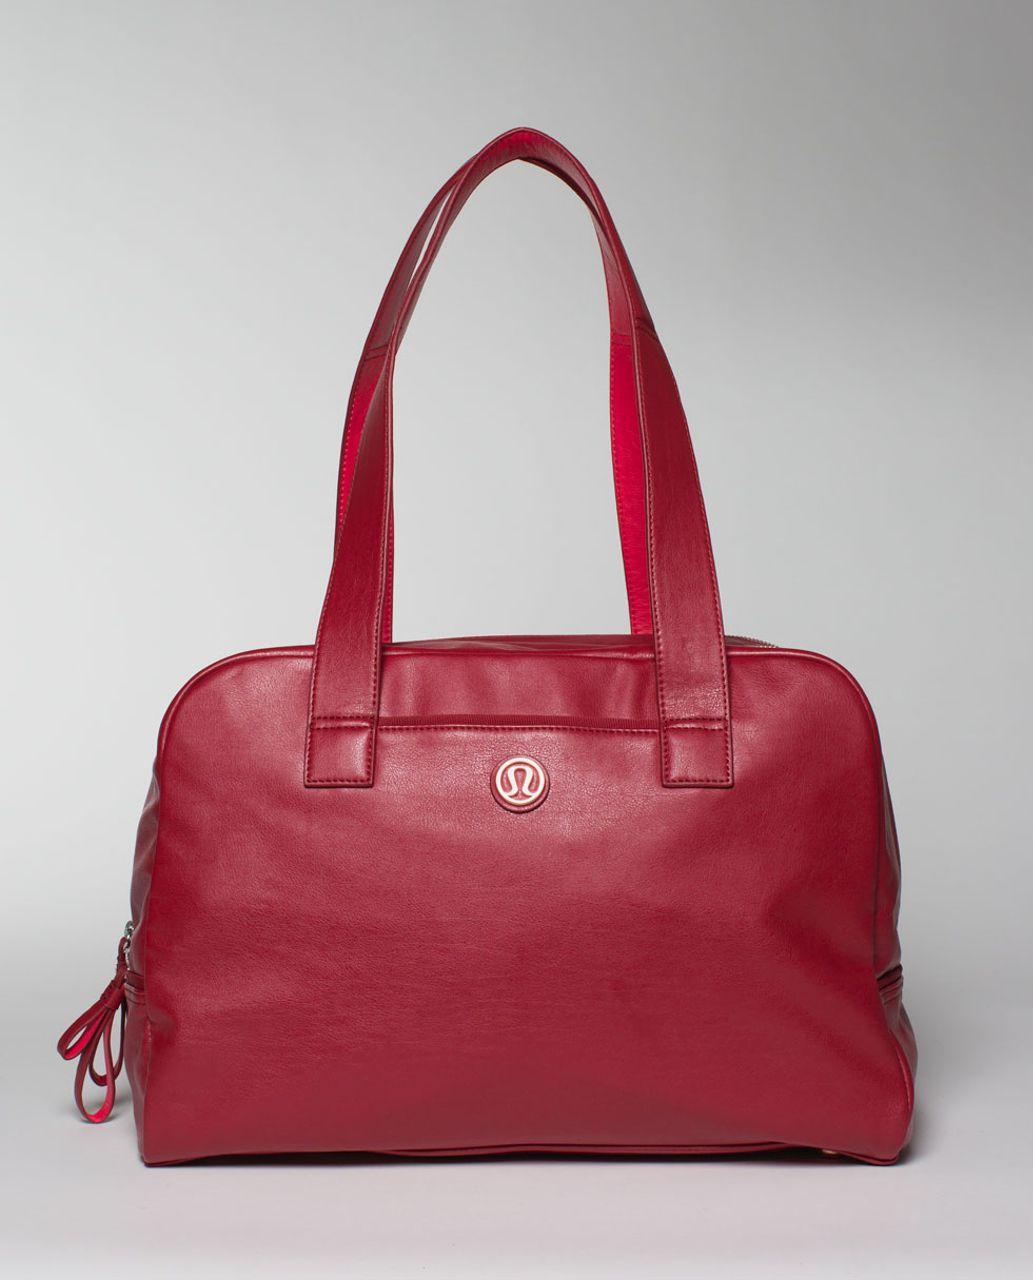 Lululemon Urban Sanctuary Bag - Deepest Cranberry / Boom Juice